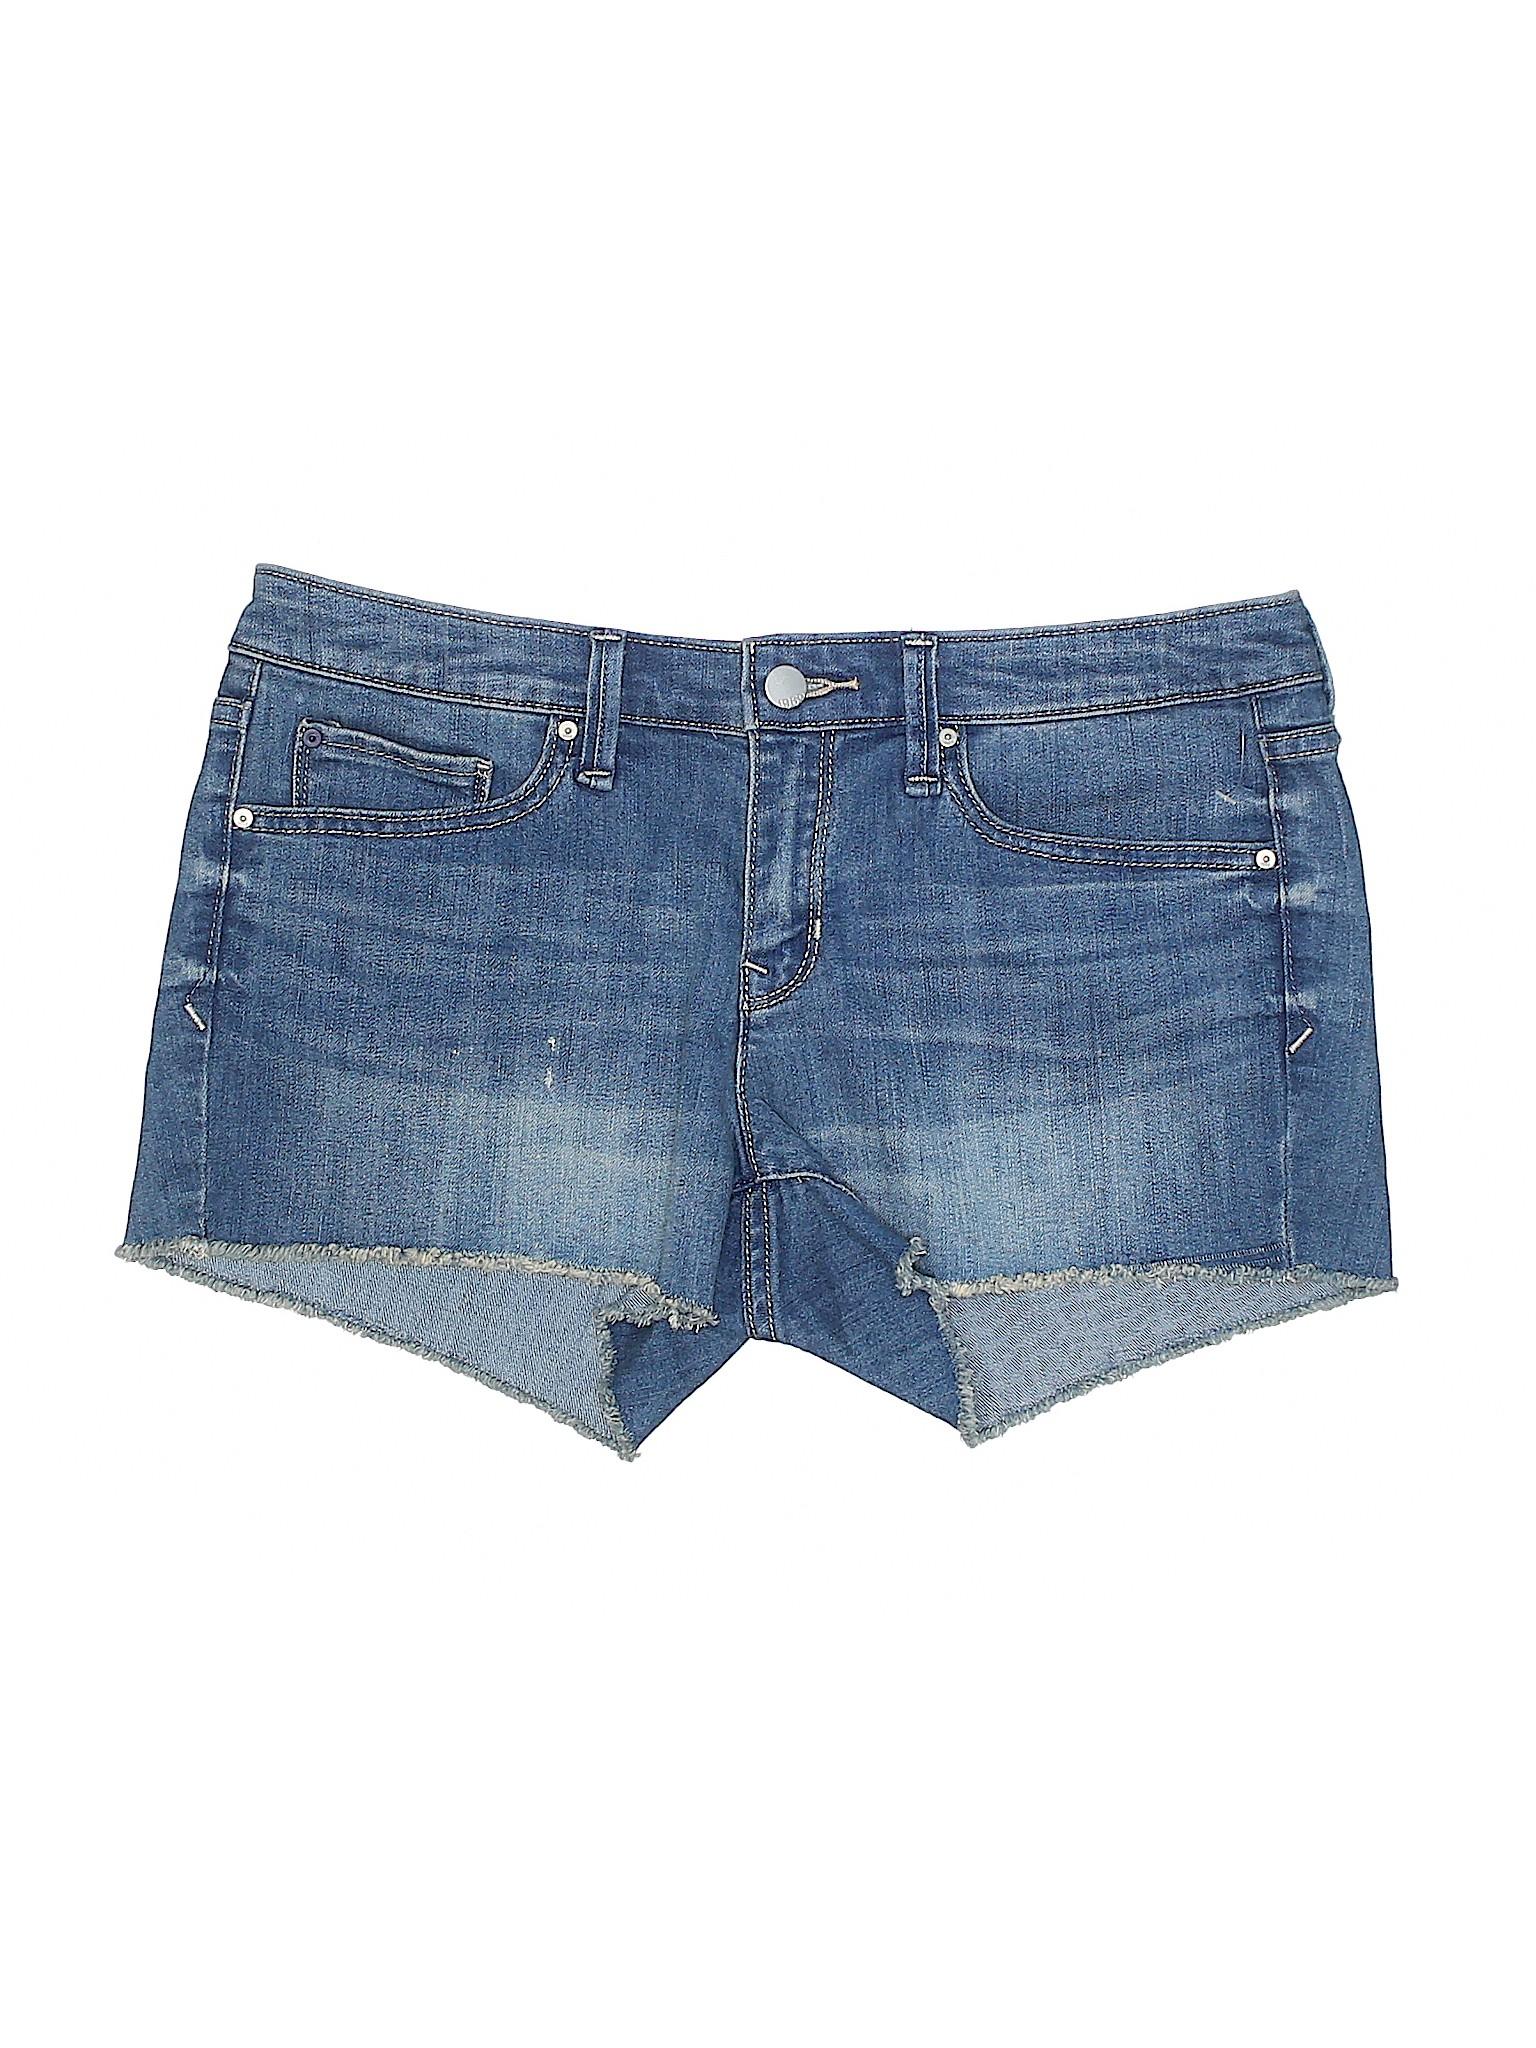 Shorts Gap Denim Boutique Gap Boutique HIxqwEBpnO